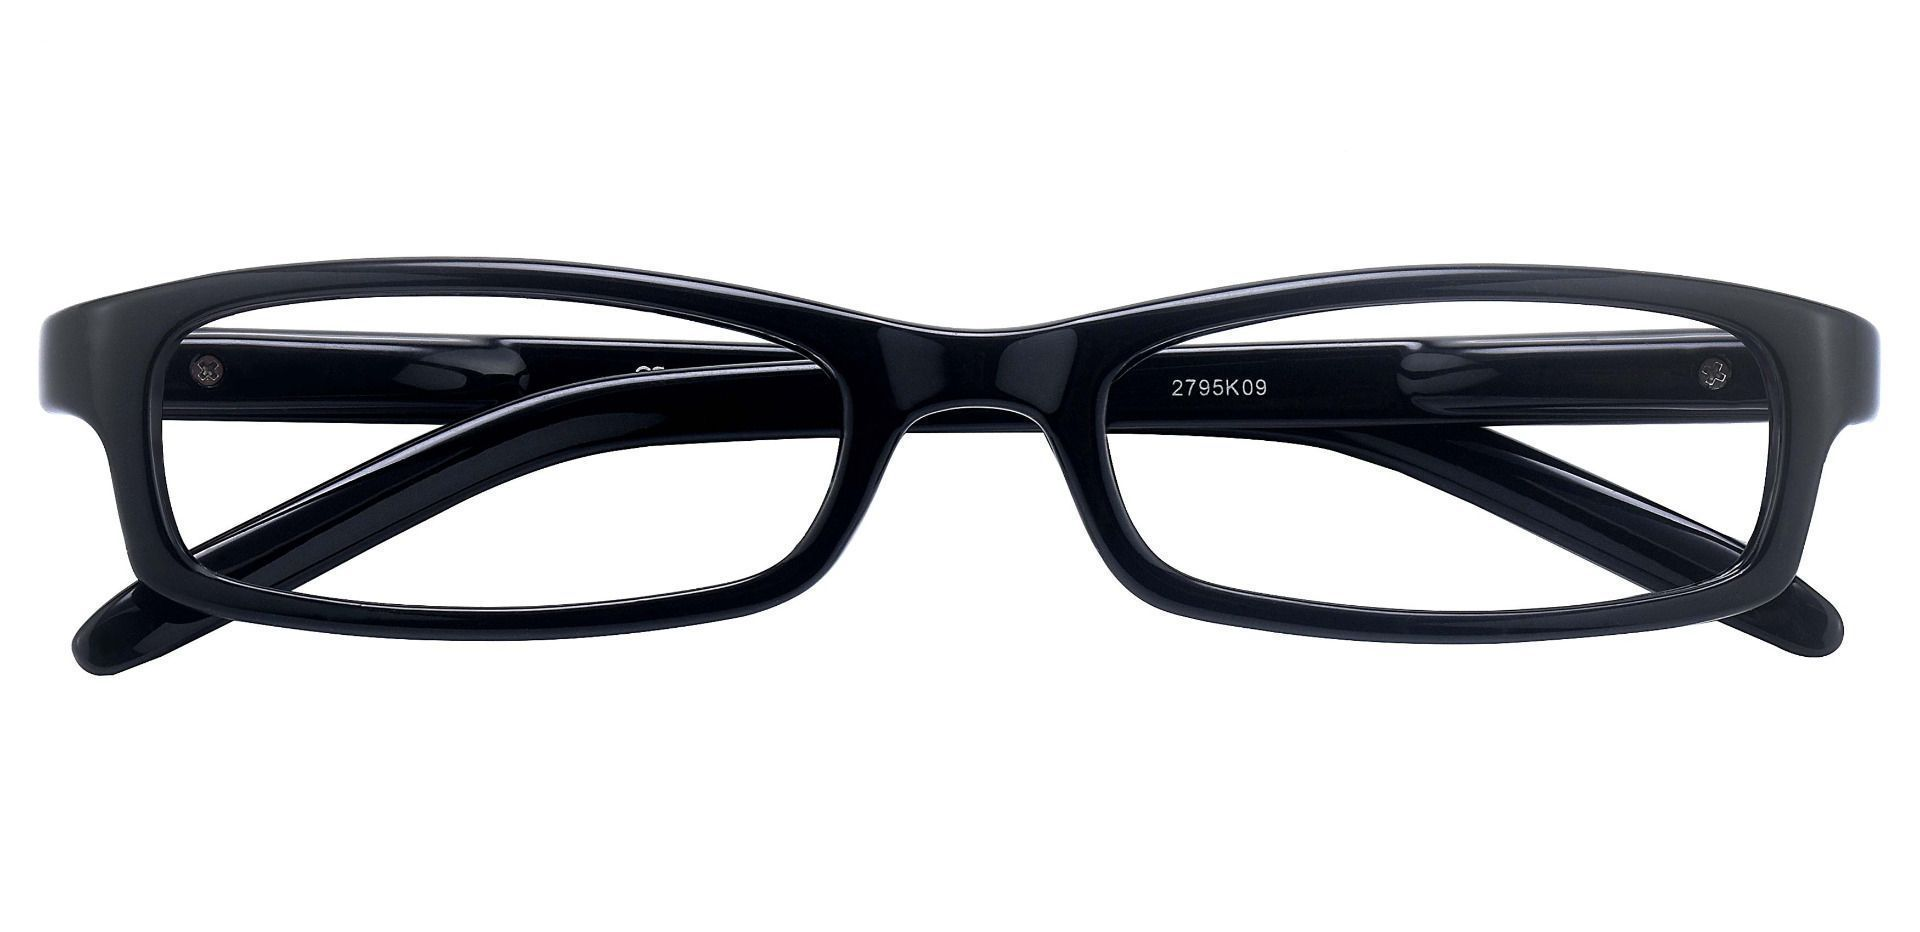 Palmer Rectangle Single Vision Glasses - Black